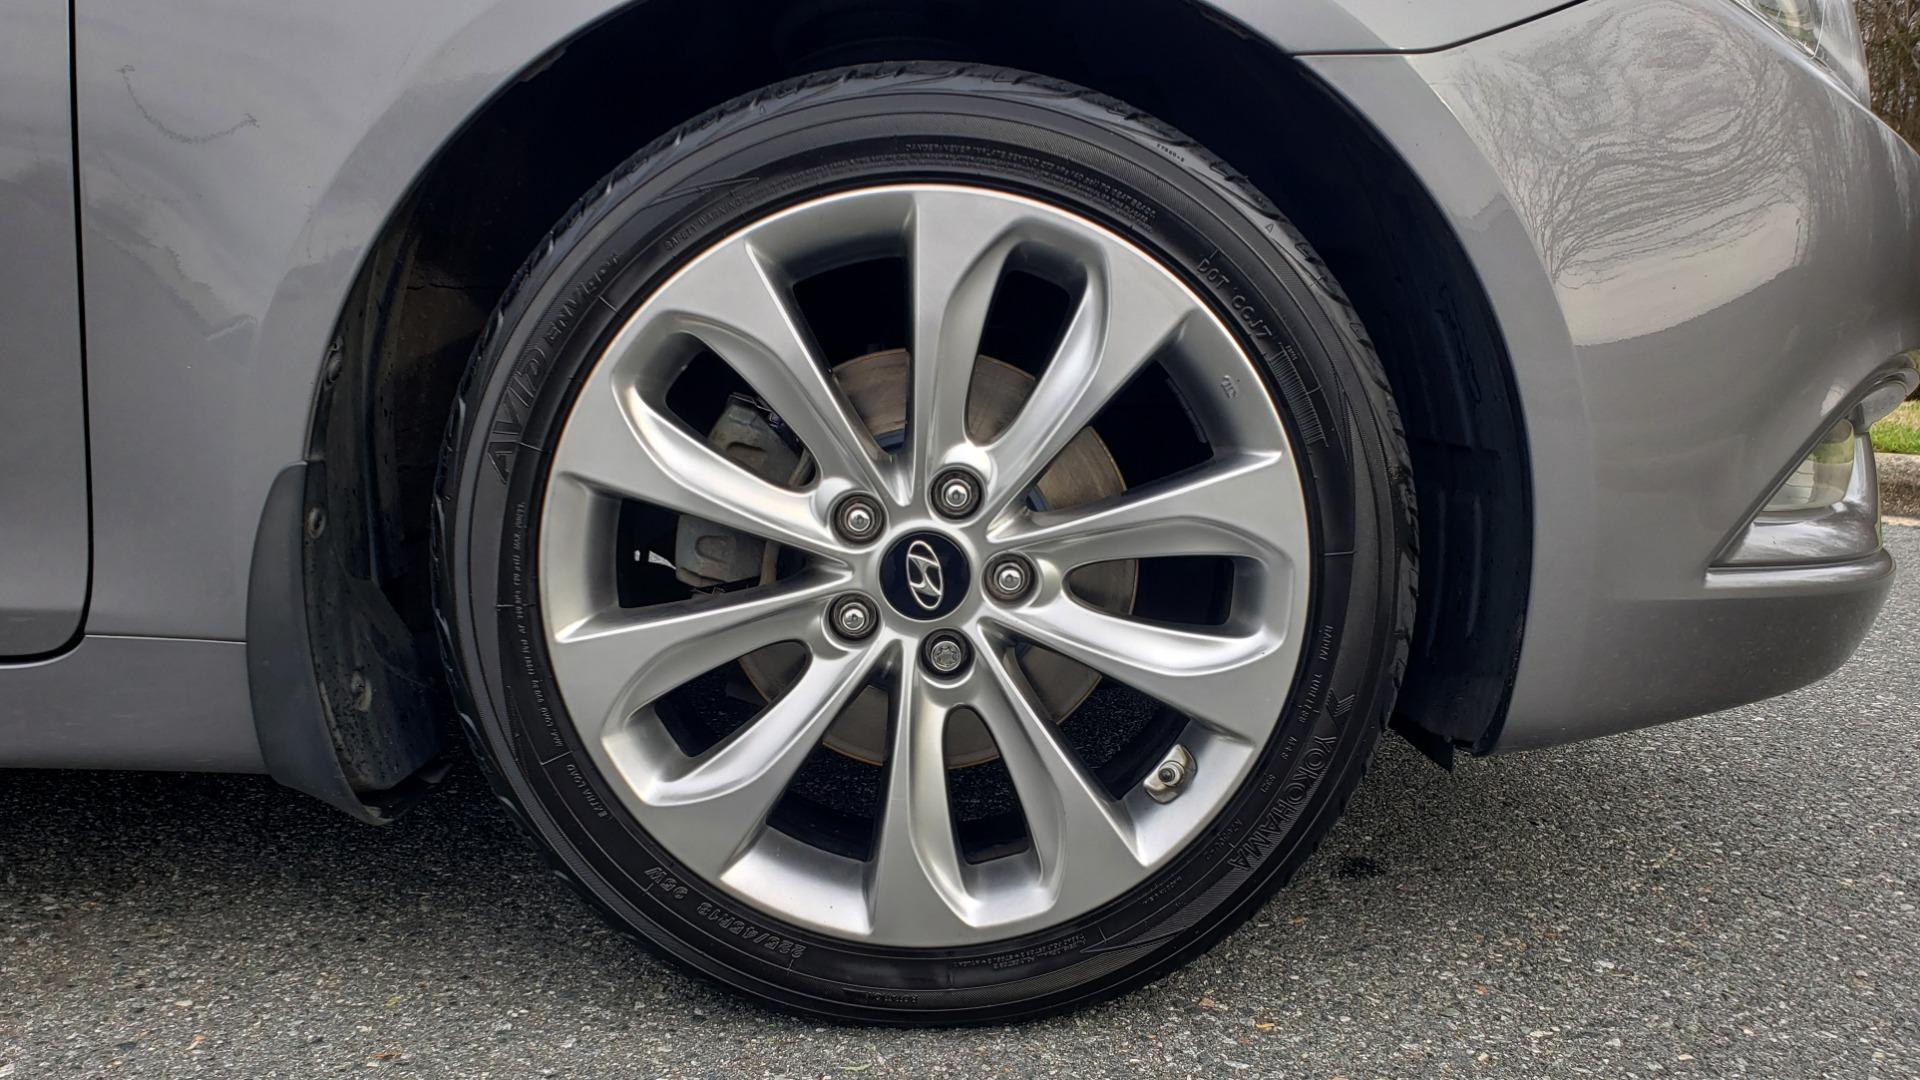 Used 2013 Hyundai SONATA SE AUTO / 2.4L 4-CYL / 6-SPD AUTO / VERY CLEAN for sale Sold at Formula Imports in Charlotte NC 28227 12